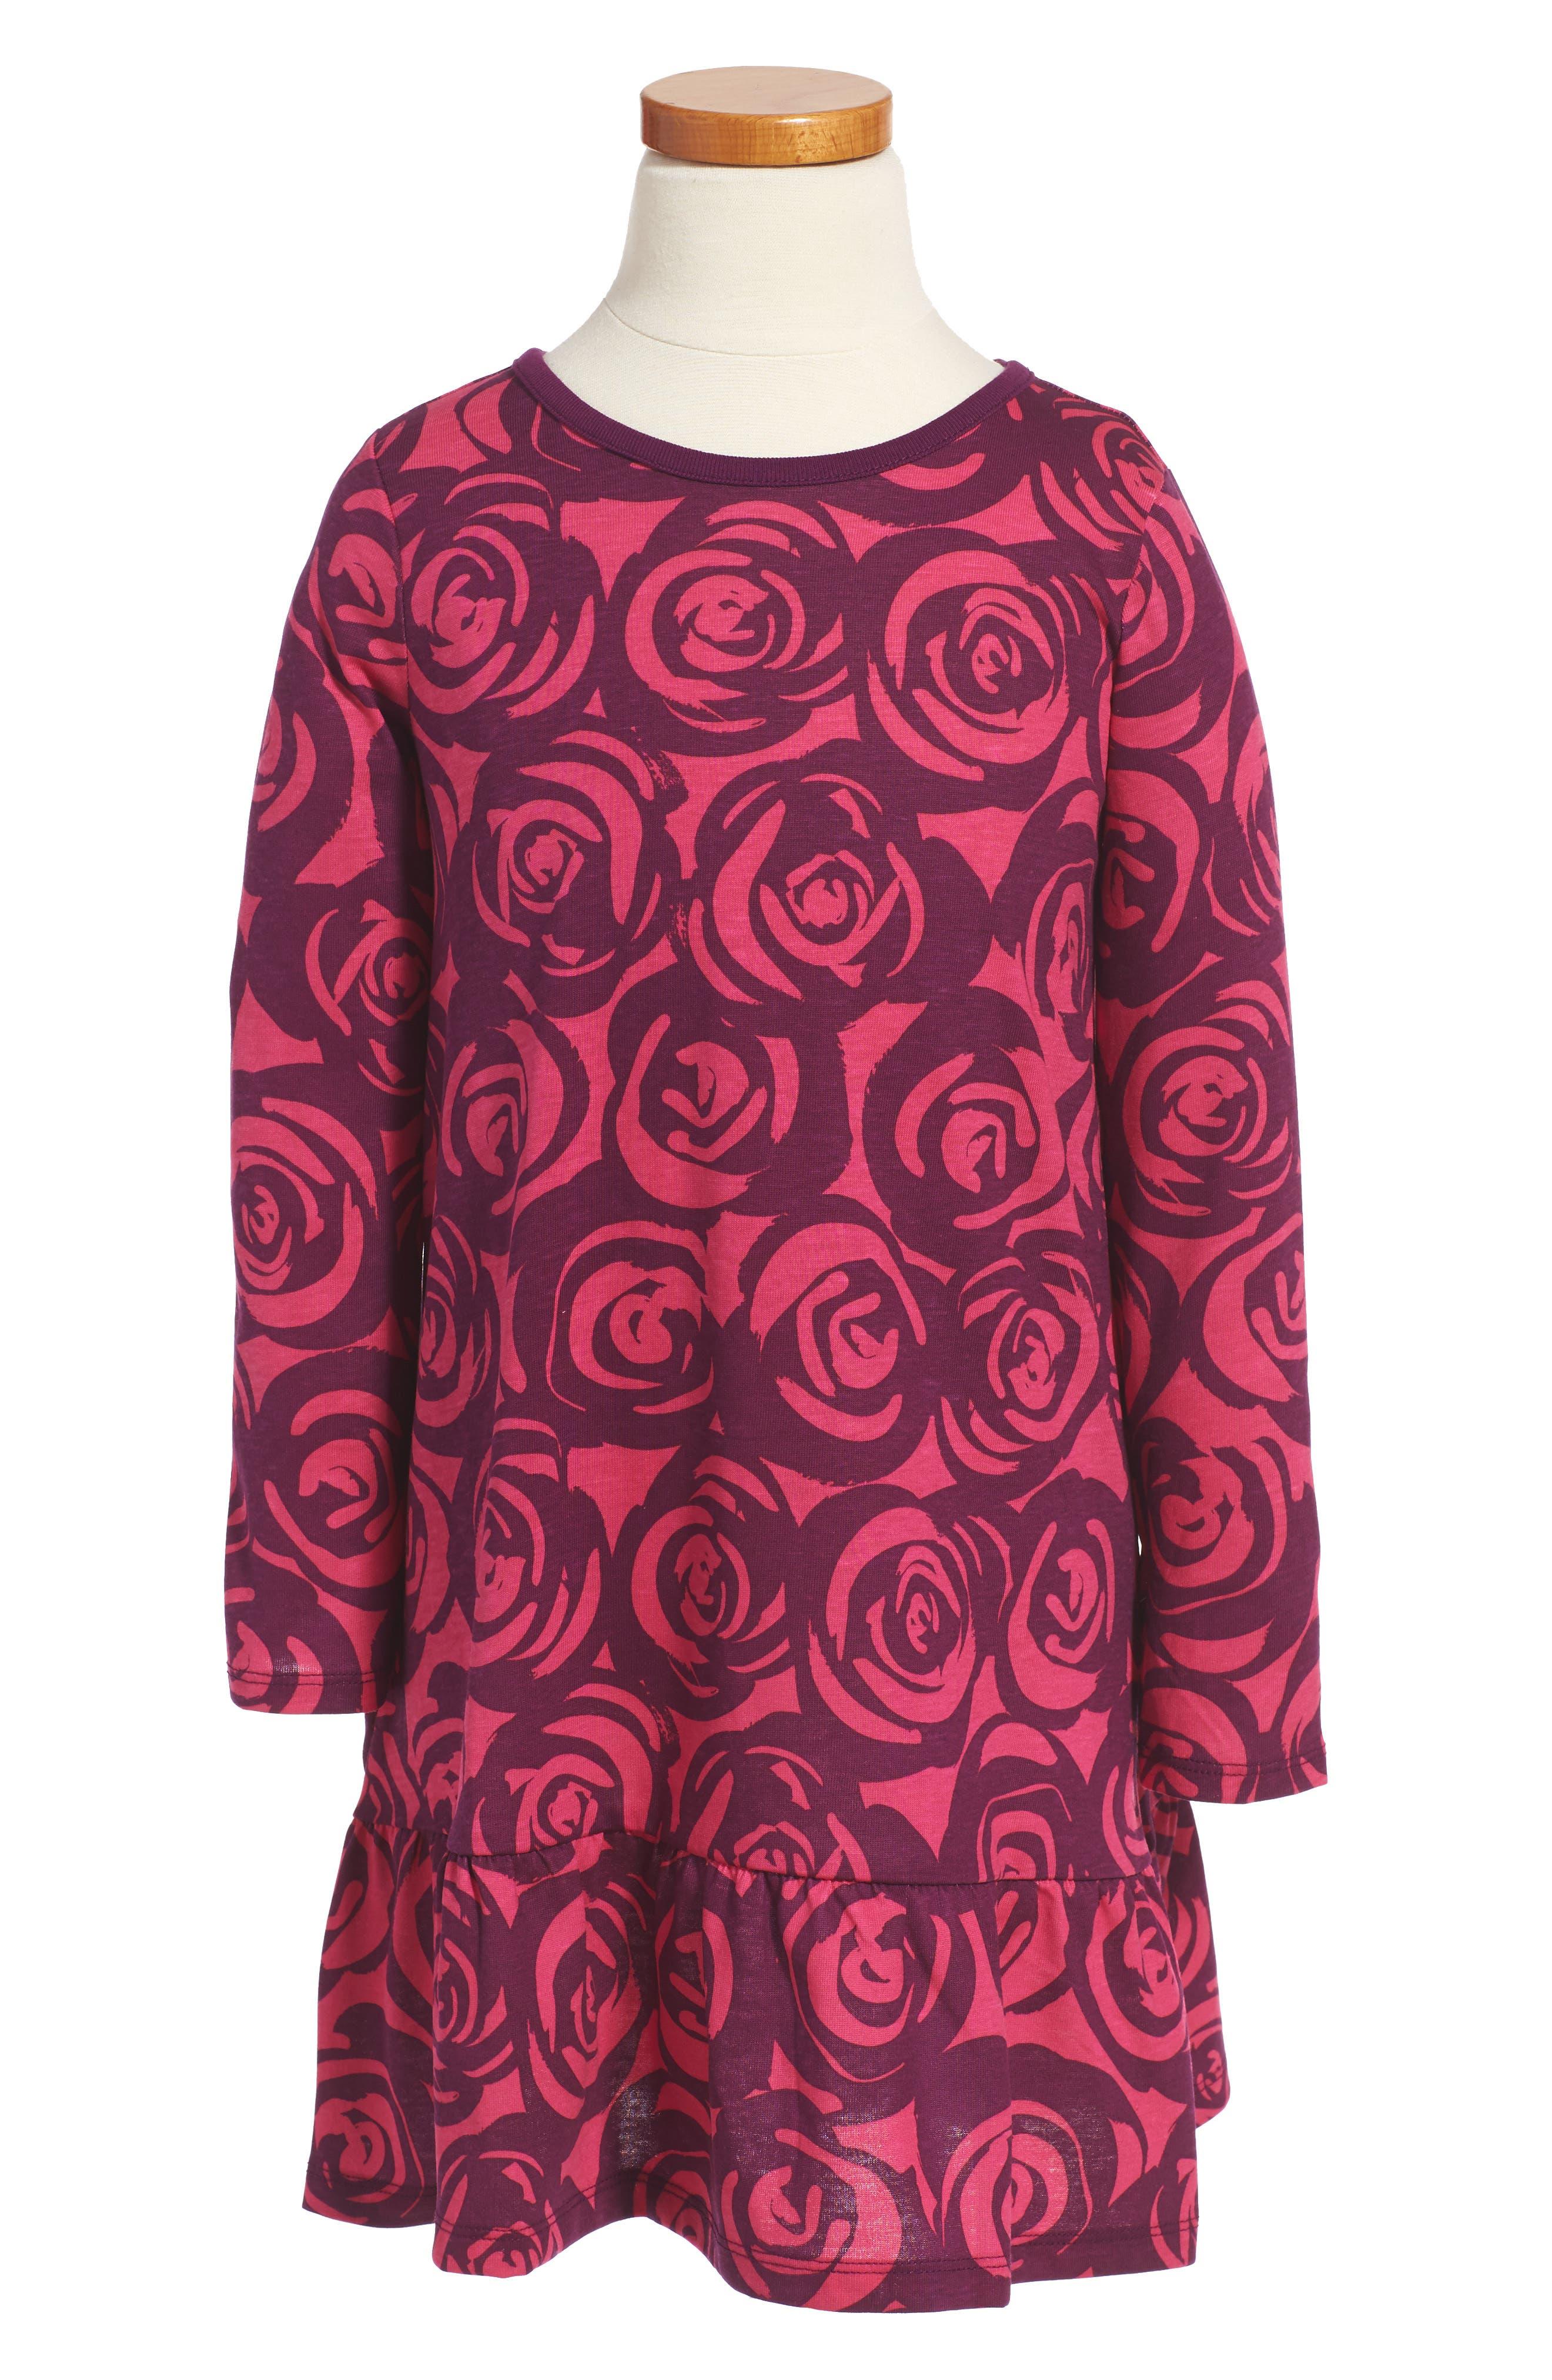 Rennie Rose Ruffle Dress,                             Main thumbnail 1, color,                             Pink